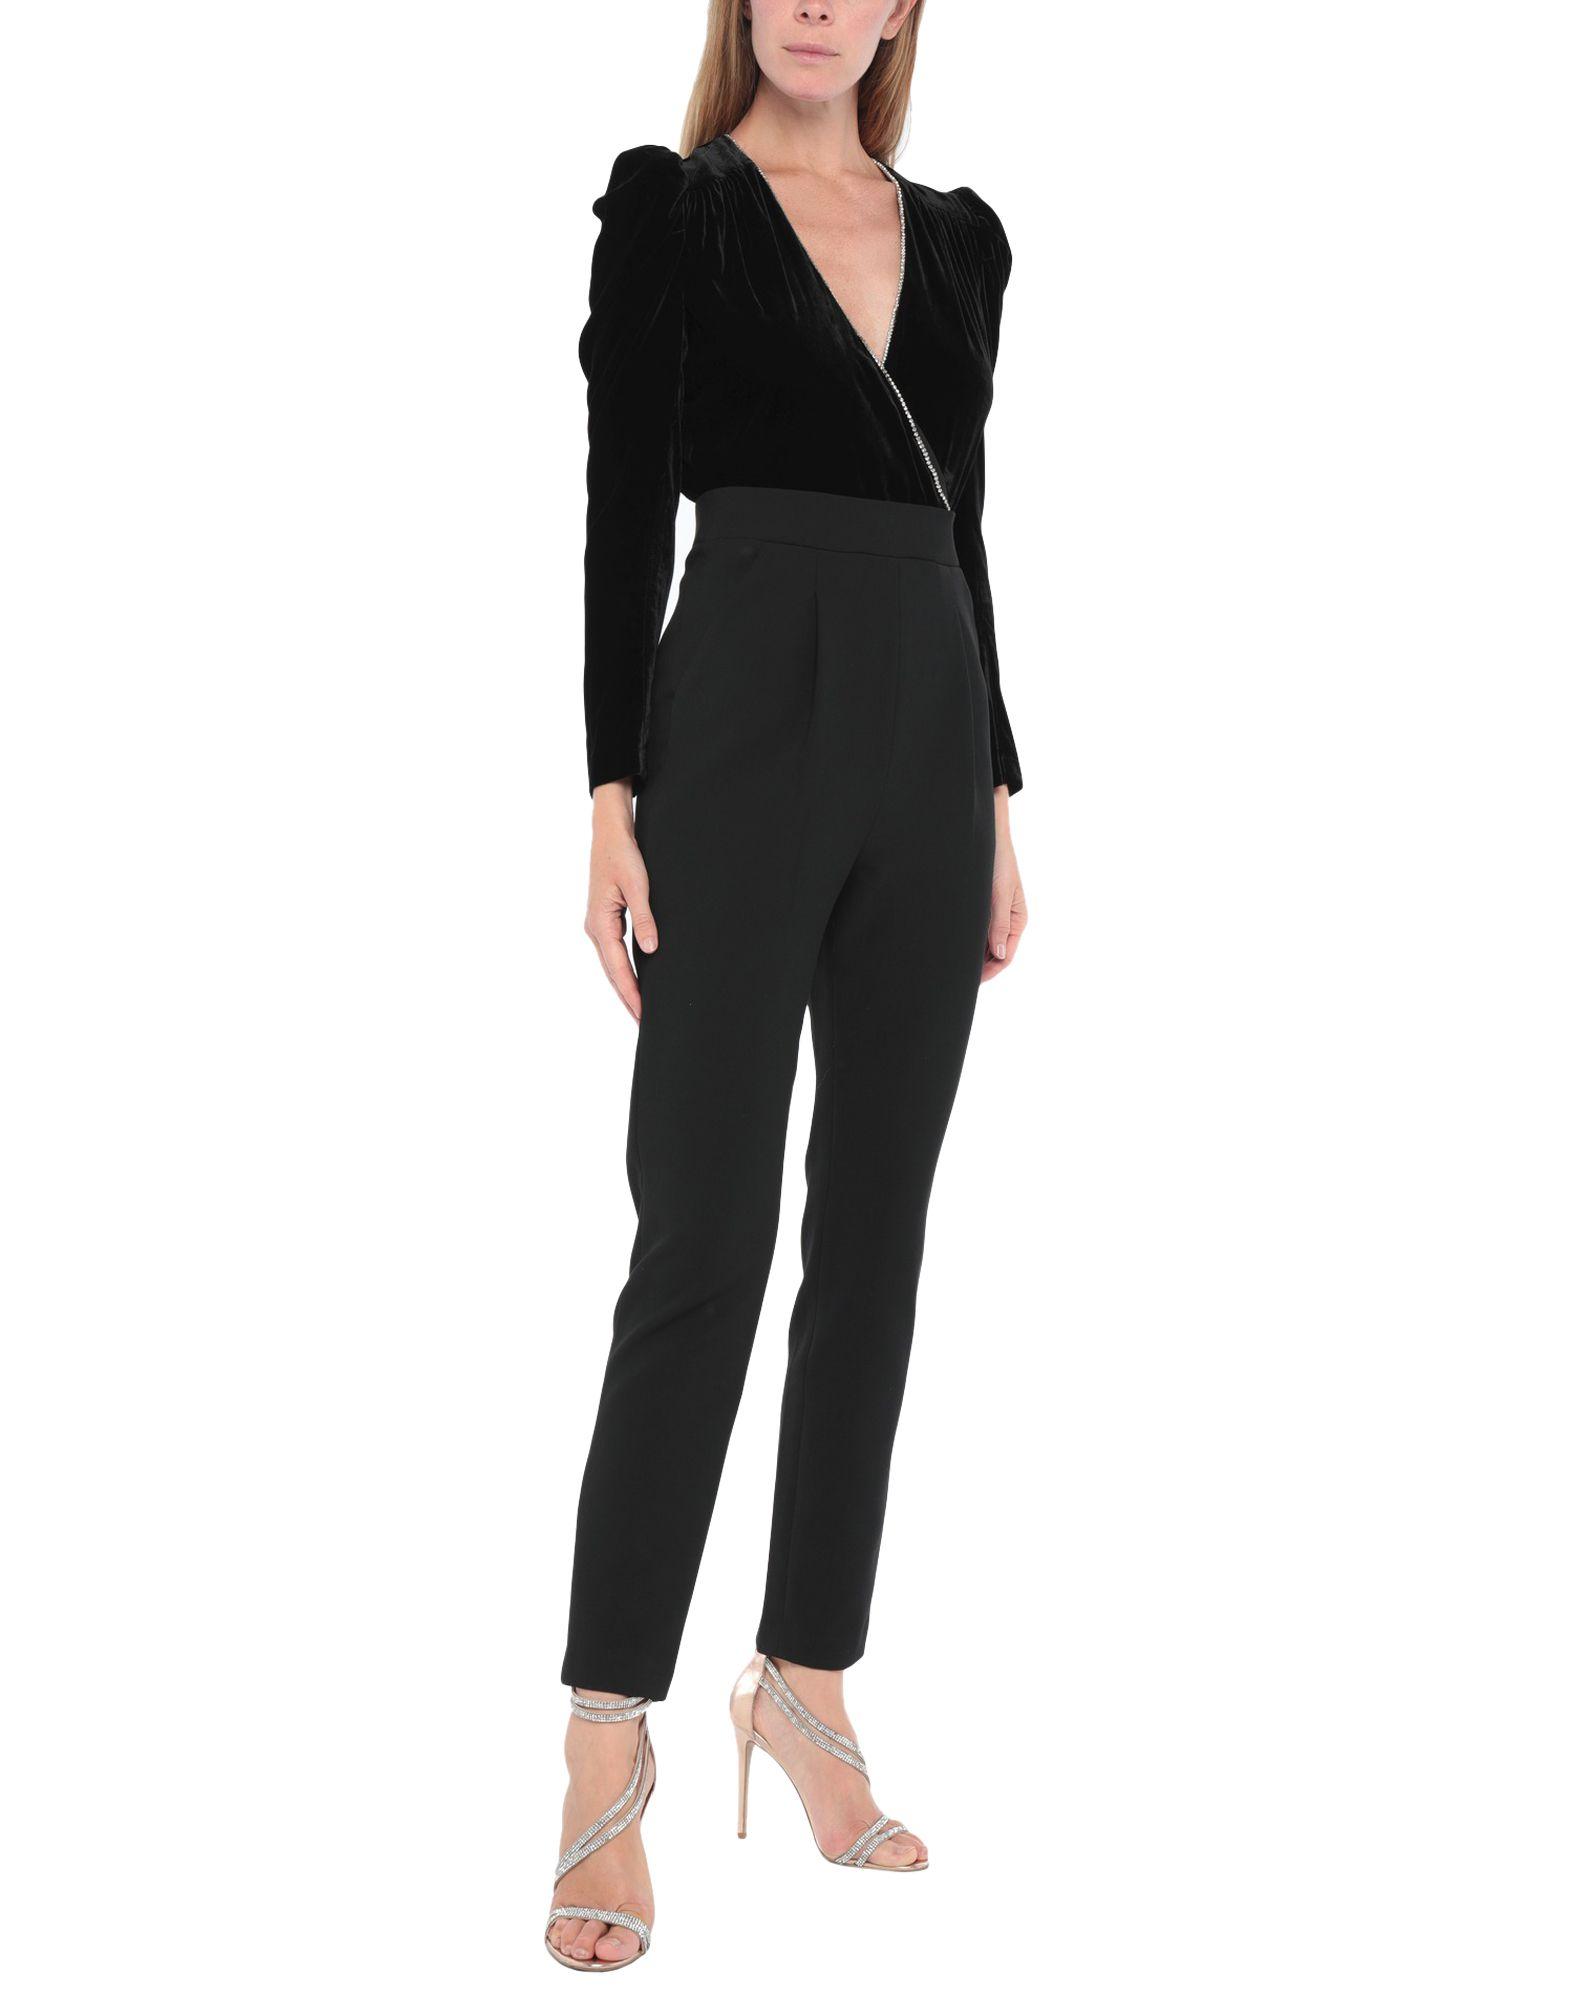 VERONICA BEARD Jumpsuits. velvet, plain weave, rhinestones, solid color, long sleeves, deep neckline, multipockets, rear closure, mid rise, zipper closure, stretch. 80% Rayon, 12% Silk, 8% Elastane, Viscose, Cotton